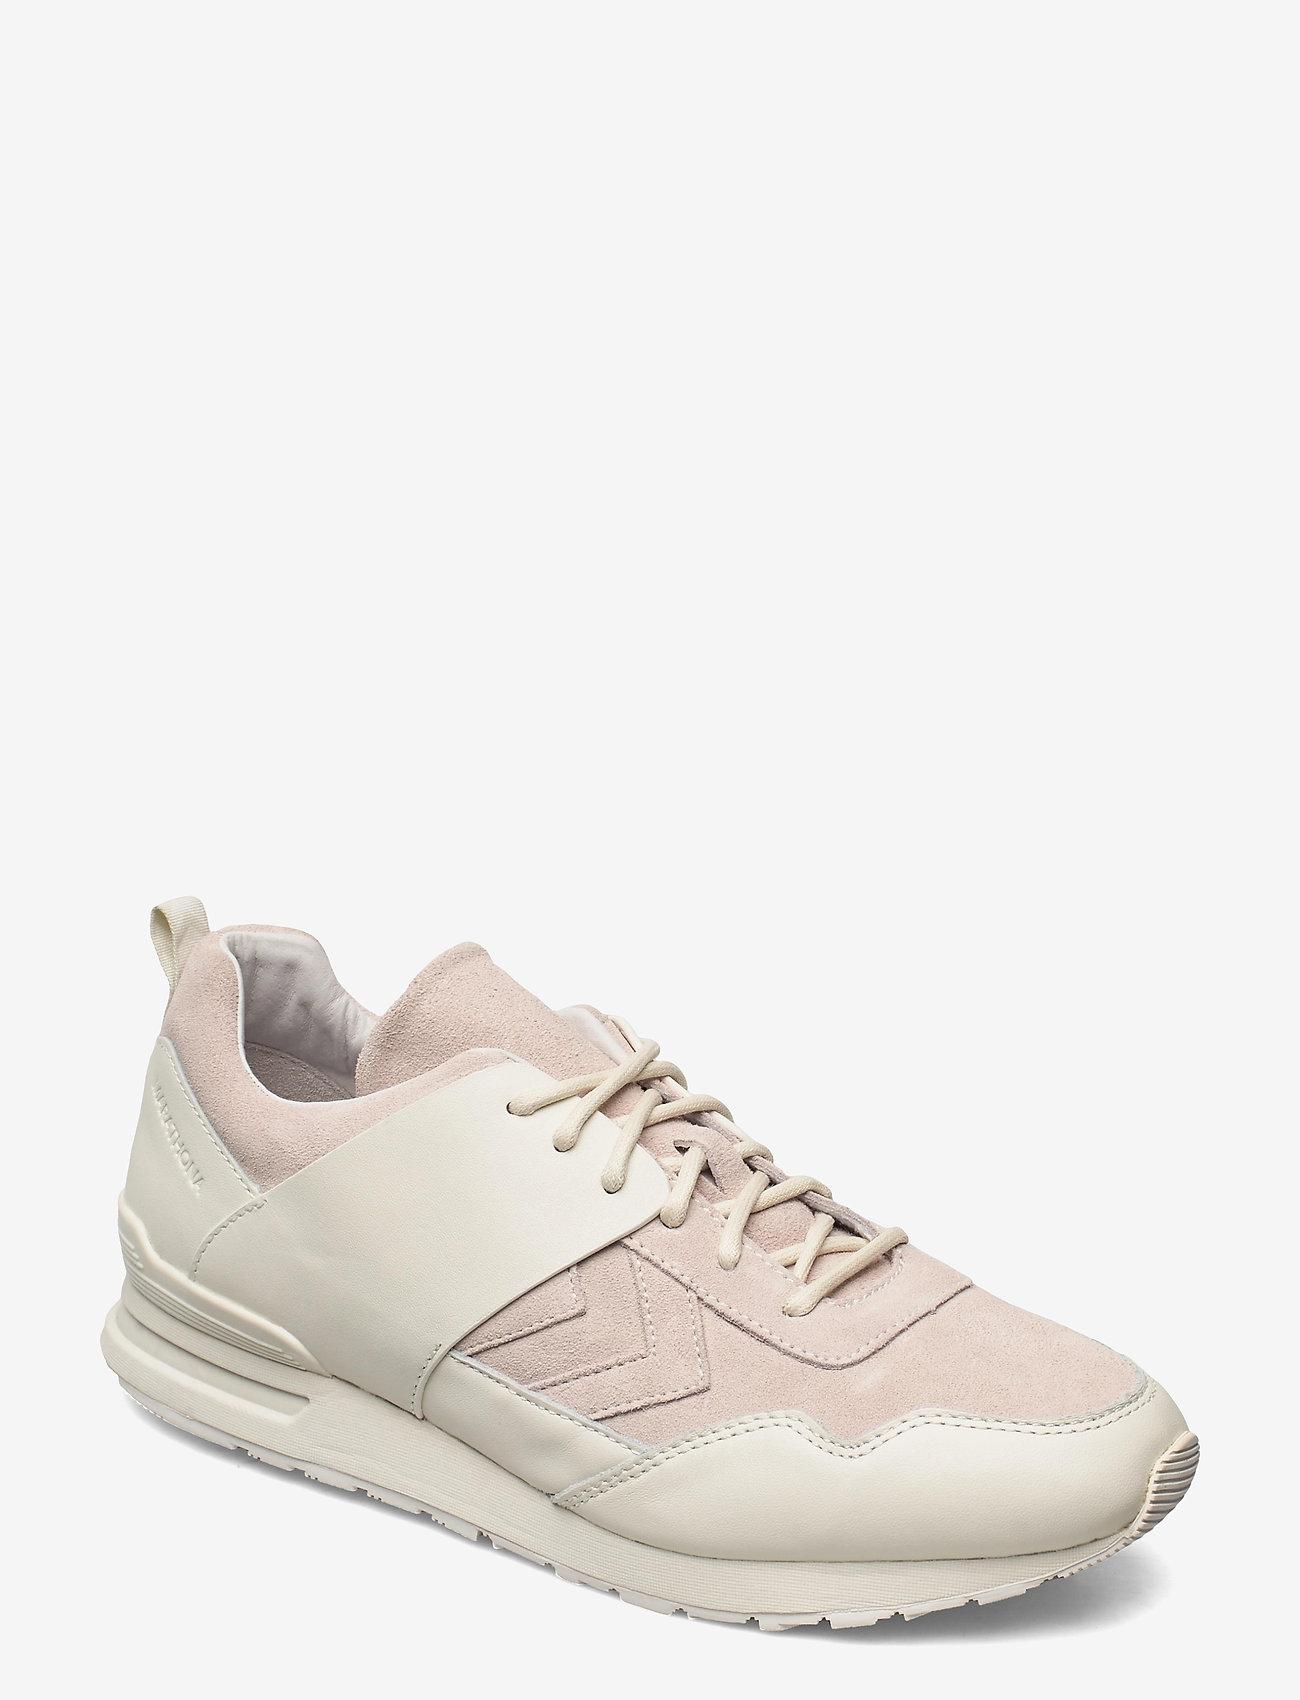 Hummel - MARATHONA 424 ATTACK - laag sneakers - off white - 1